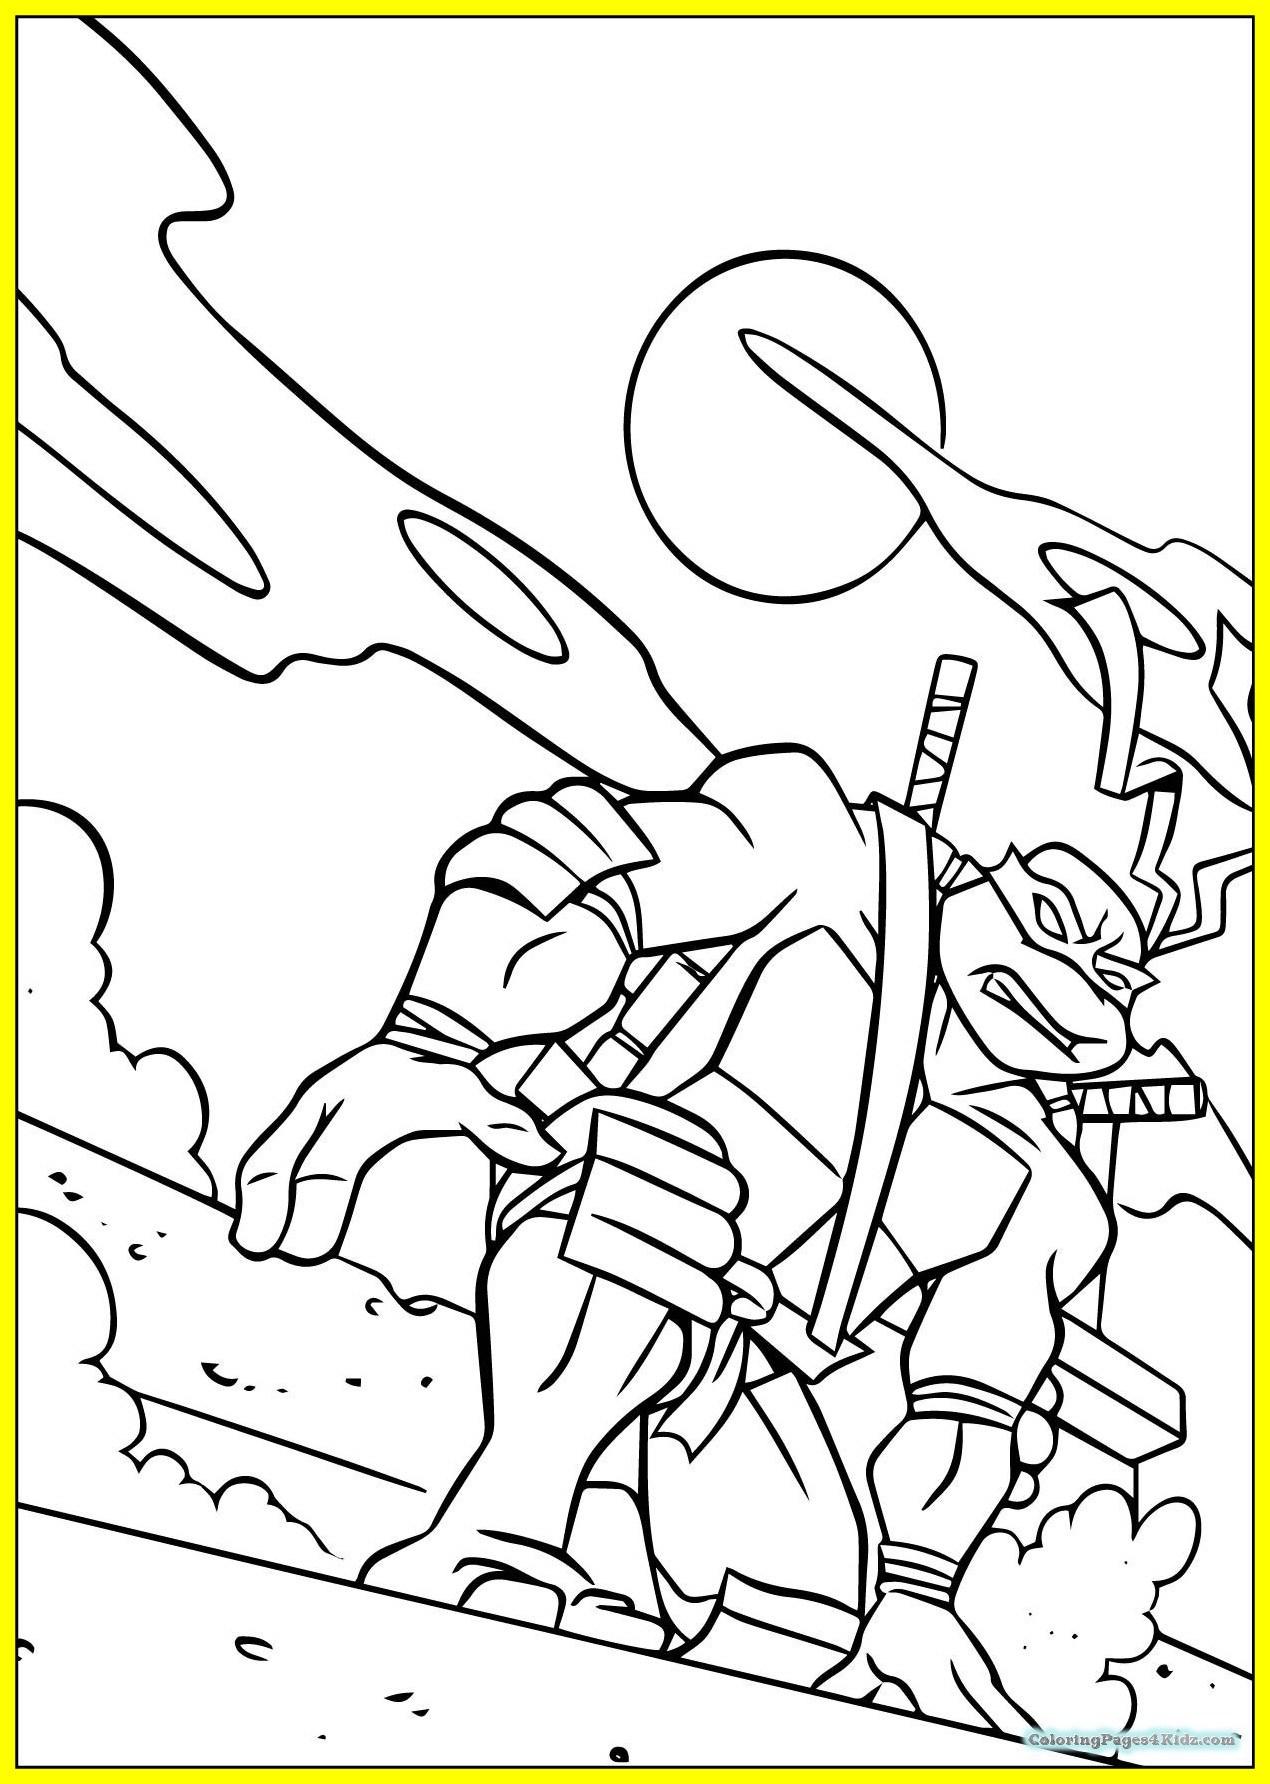 1270x1784 Fascinating Teenage Mutant Ninja Turtles Coloring Pages Raphael